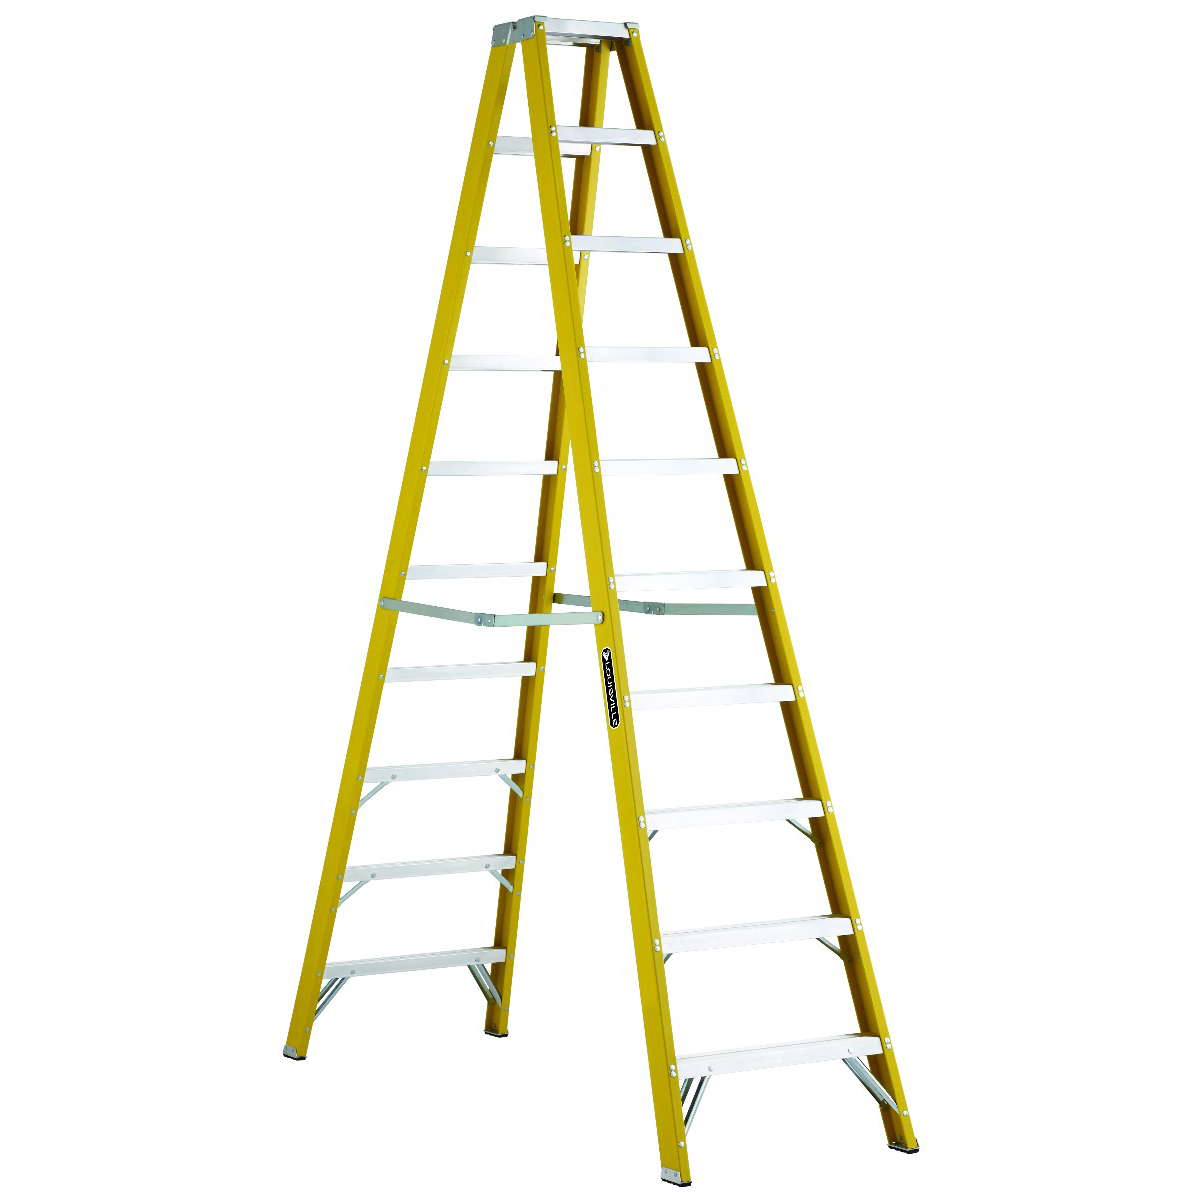 Louisville Ladder(ルイビルラダー) ファイバー脚立ツインステップ[イエロー]耐荷重110kg【10ft(300cm)】